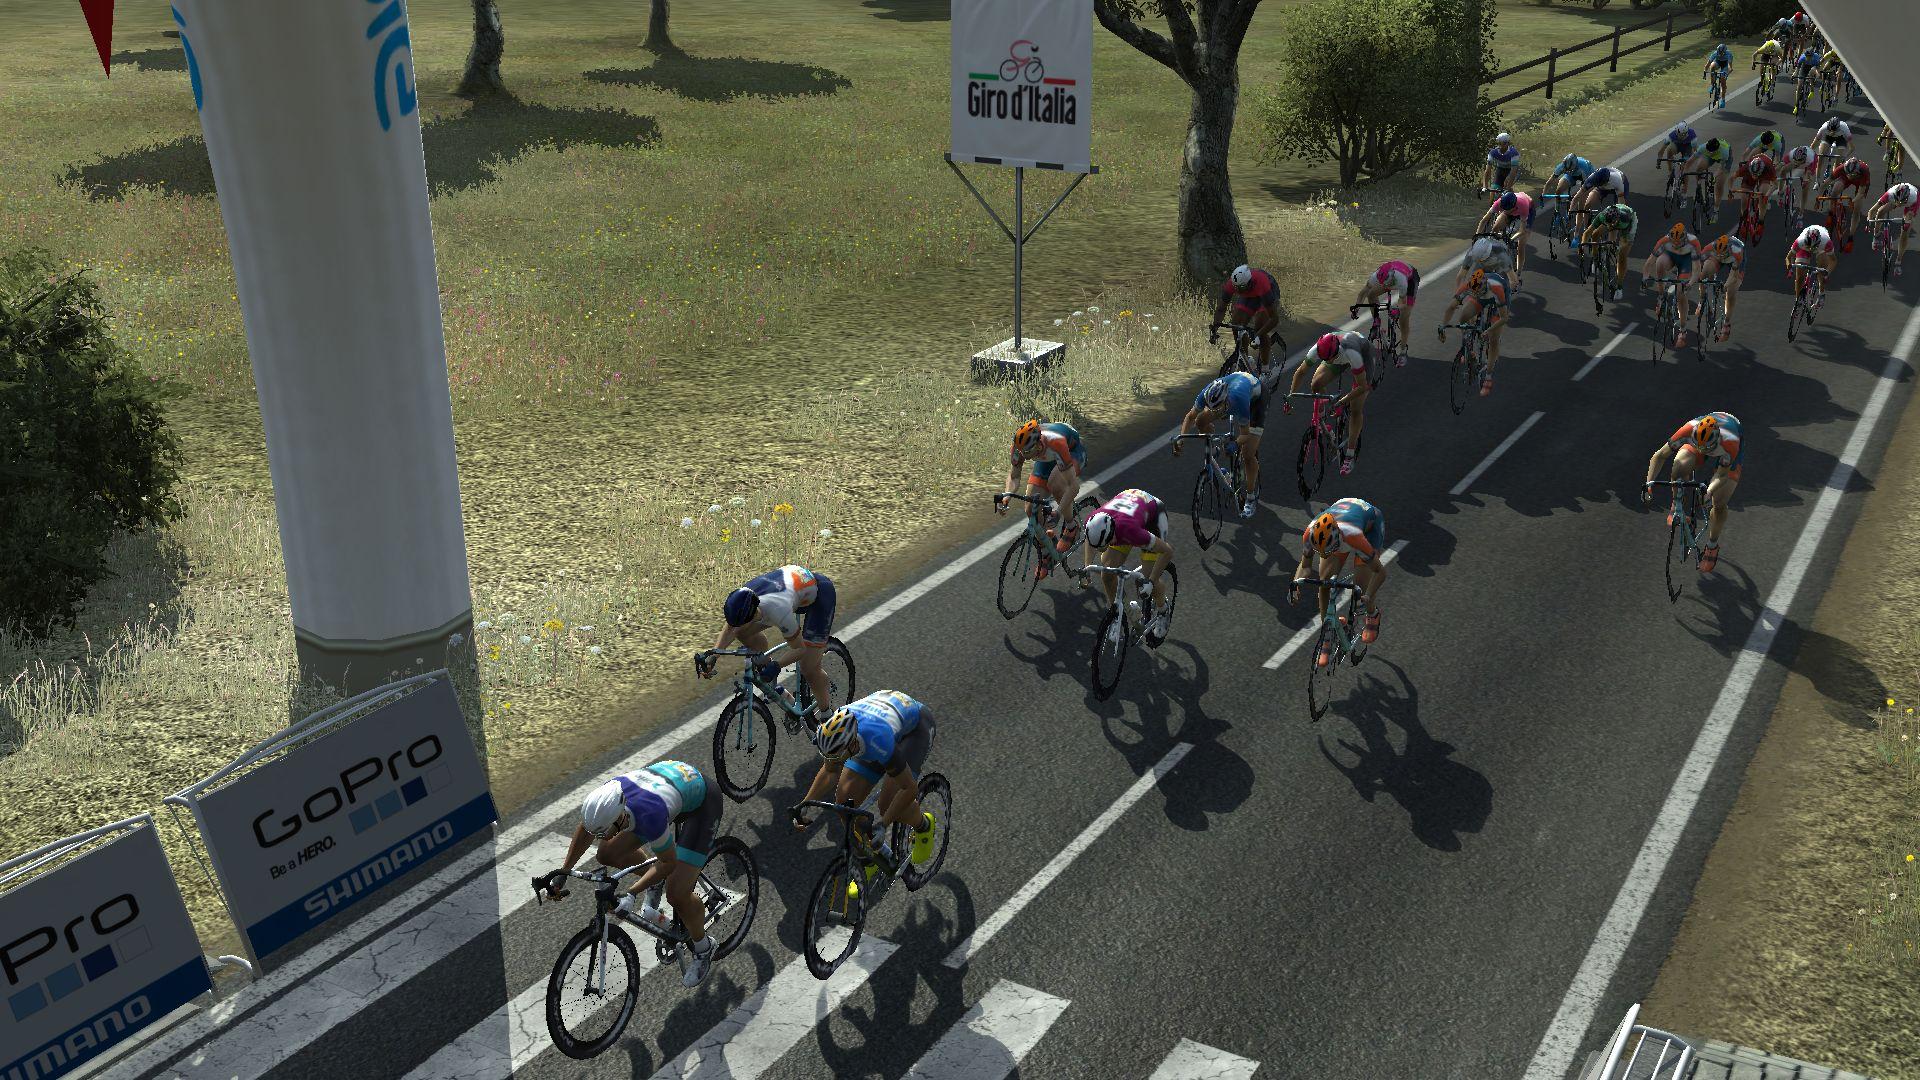 pcmdaily.com/images/mg/2018/Races/GTM/Giro/mg18_giro_07_PCM0096.jpg